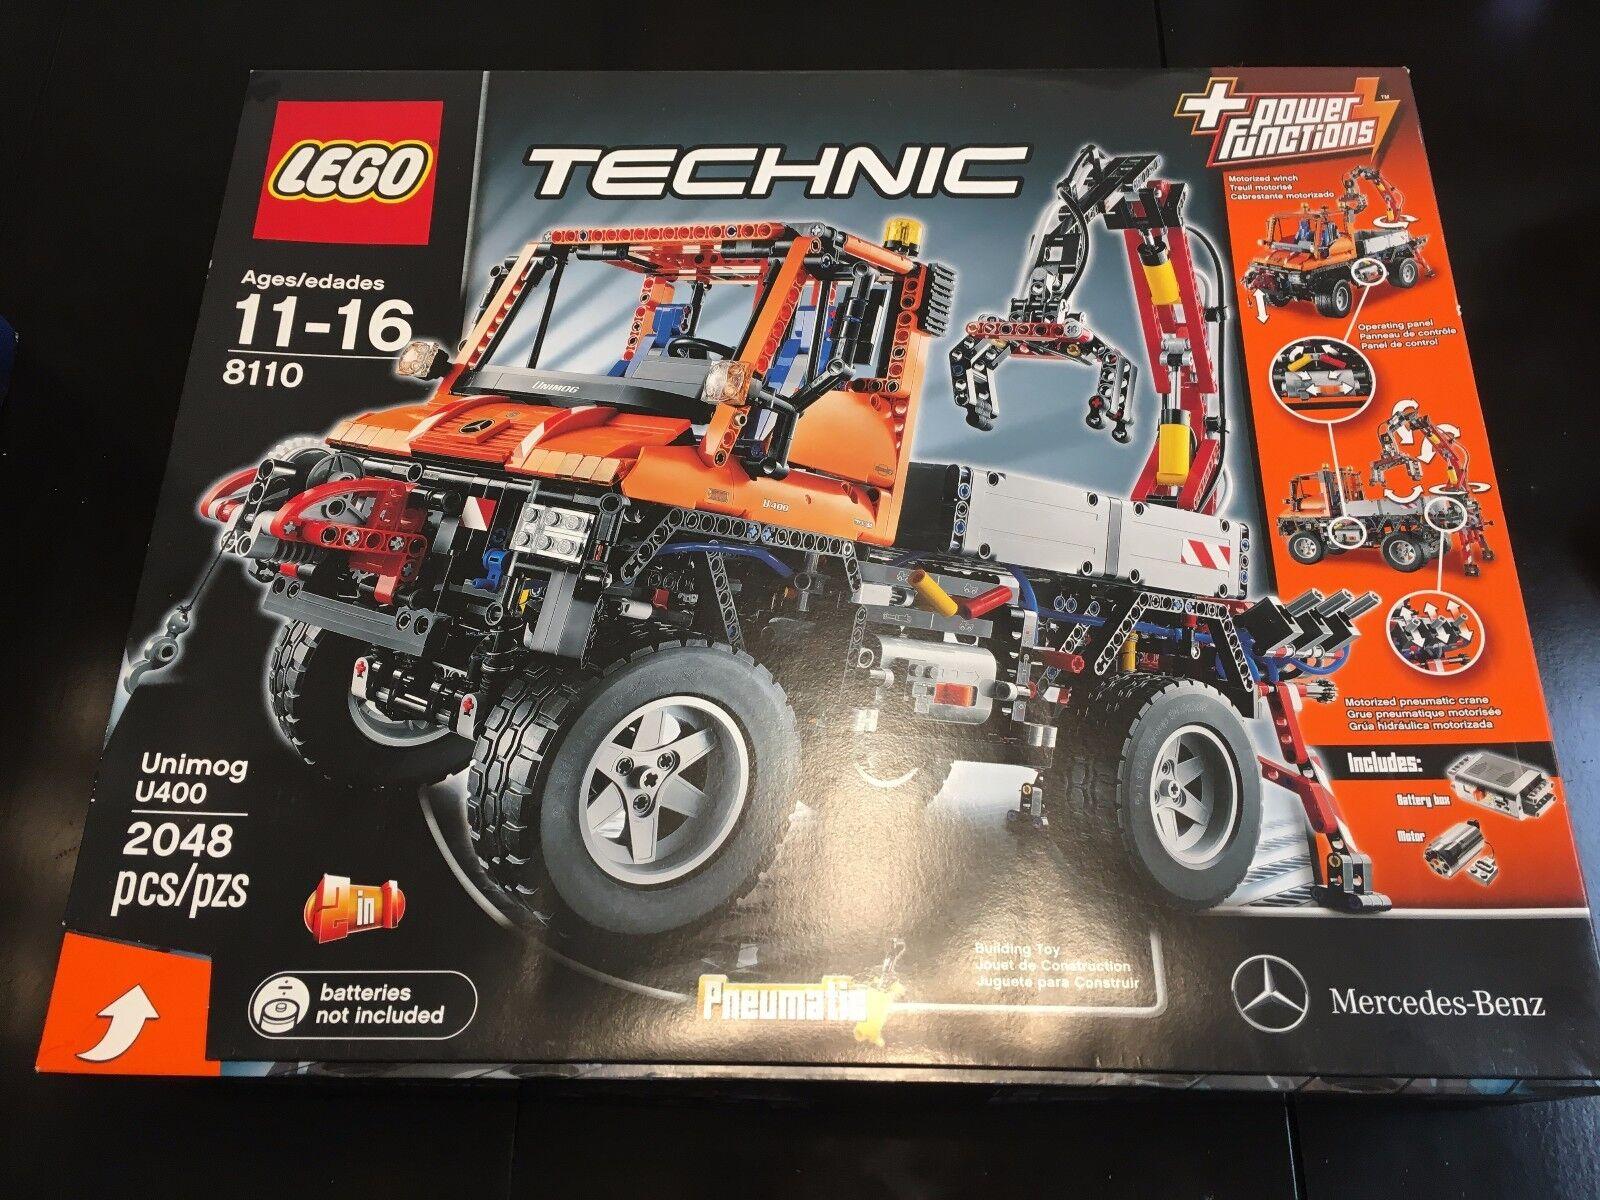 LEGO 8110 TECHNIC MERCEDES-BENZ UNIMOG U 400 & MINT SEALED NEVER OPENED RETIrosso